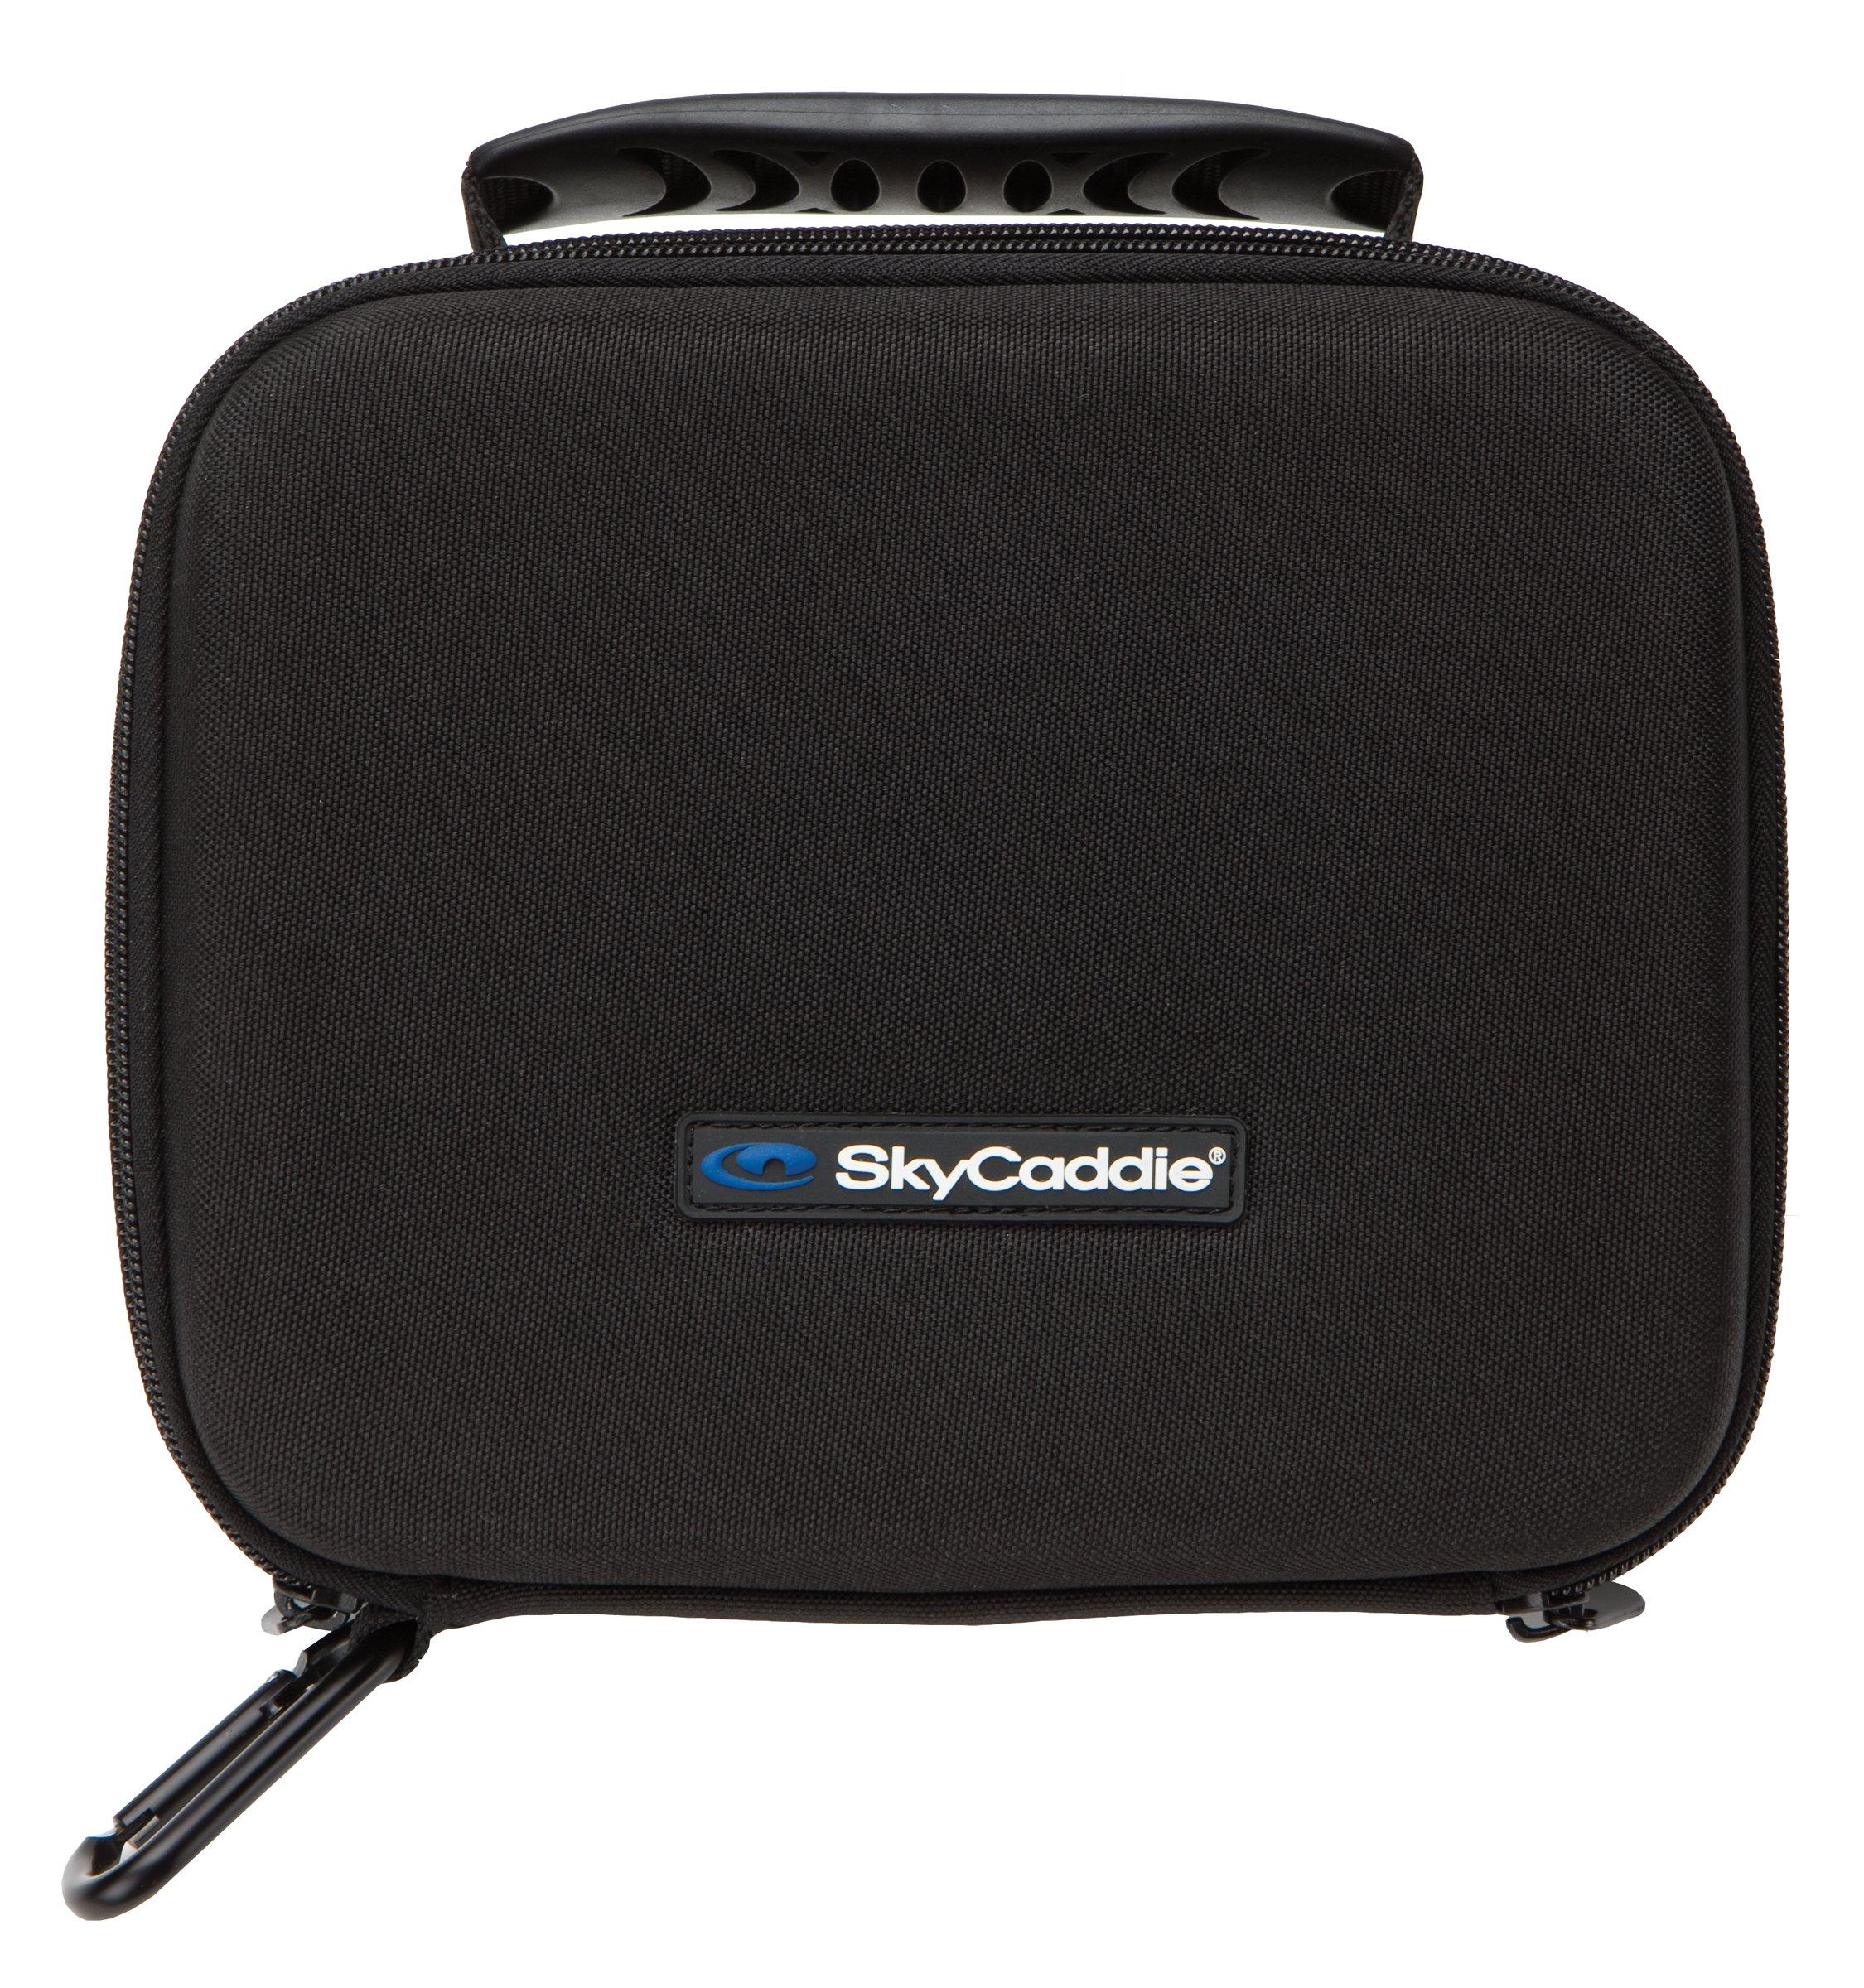 Skycaddie Golf Travel Case by SkyCaddie